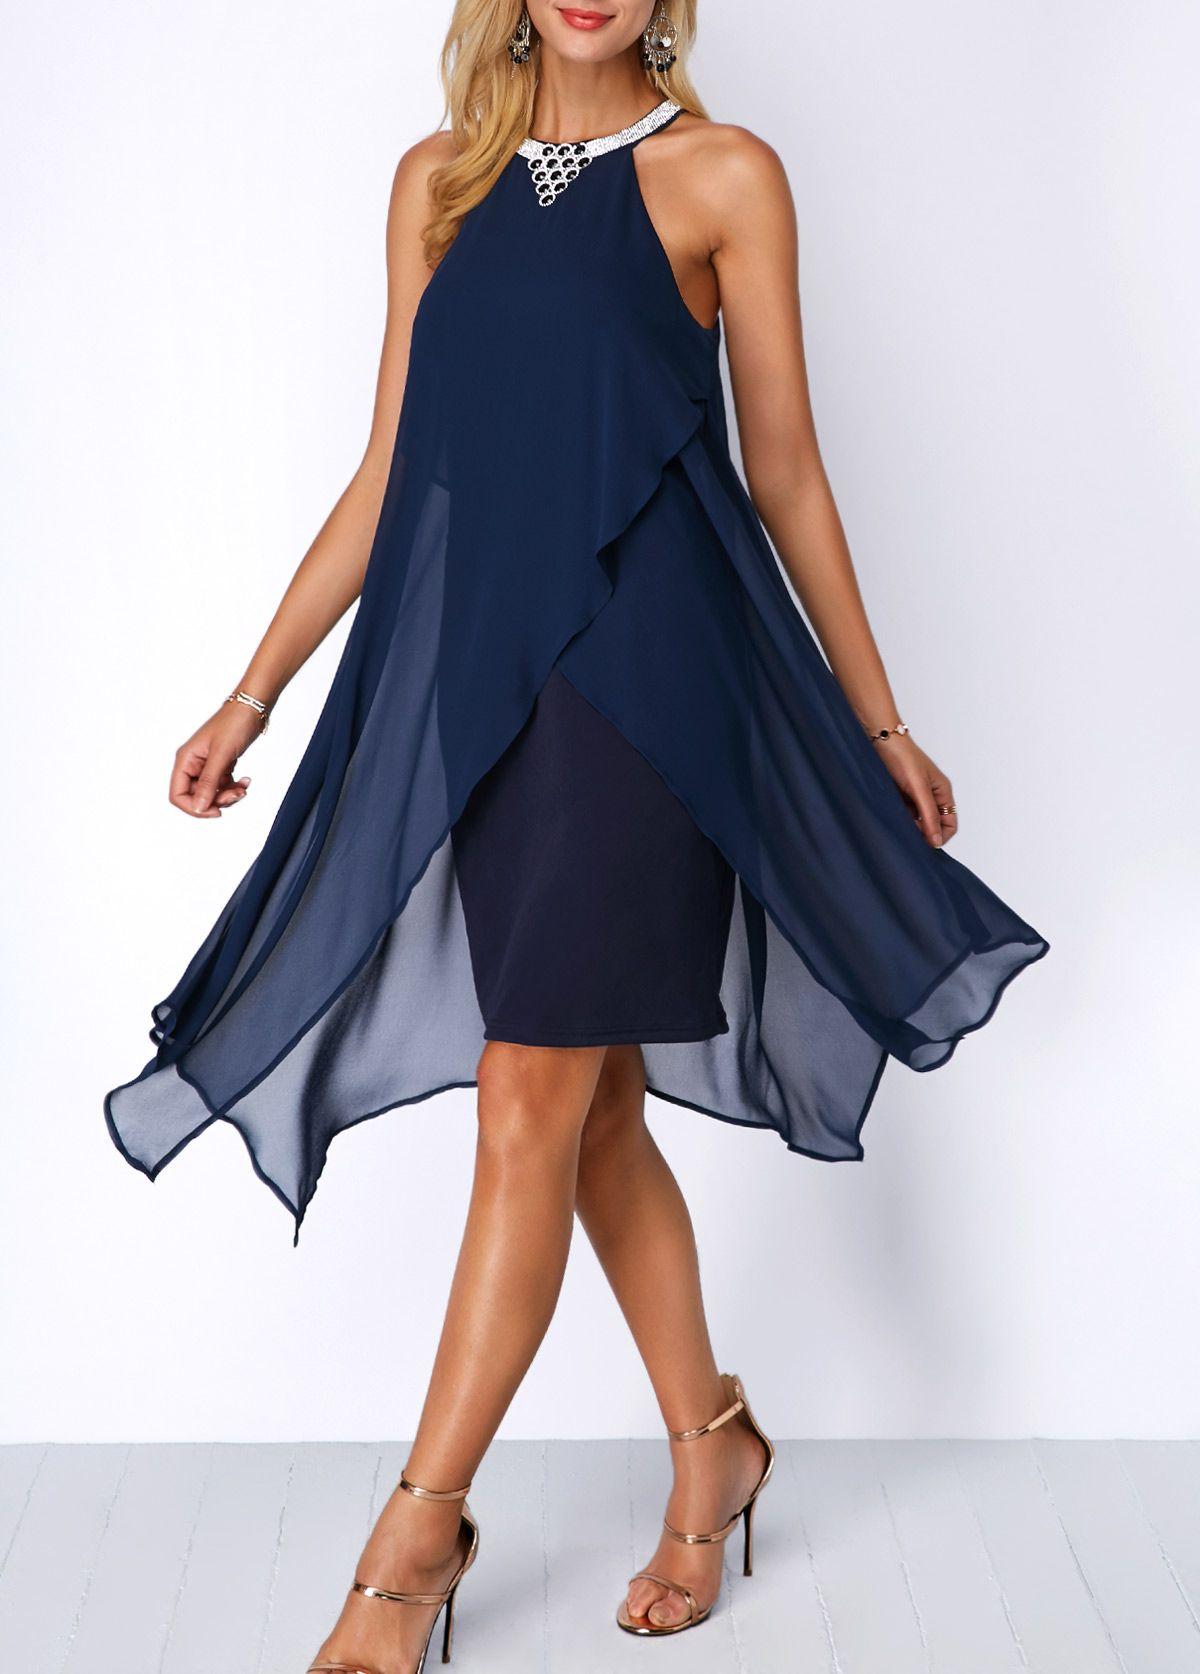 760bd5cd4c2d3 Asymmetric Hem Embellished Neck Navy Blue Chiffon Dress | Rosewe.com - USD  $35.78